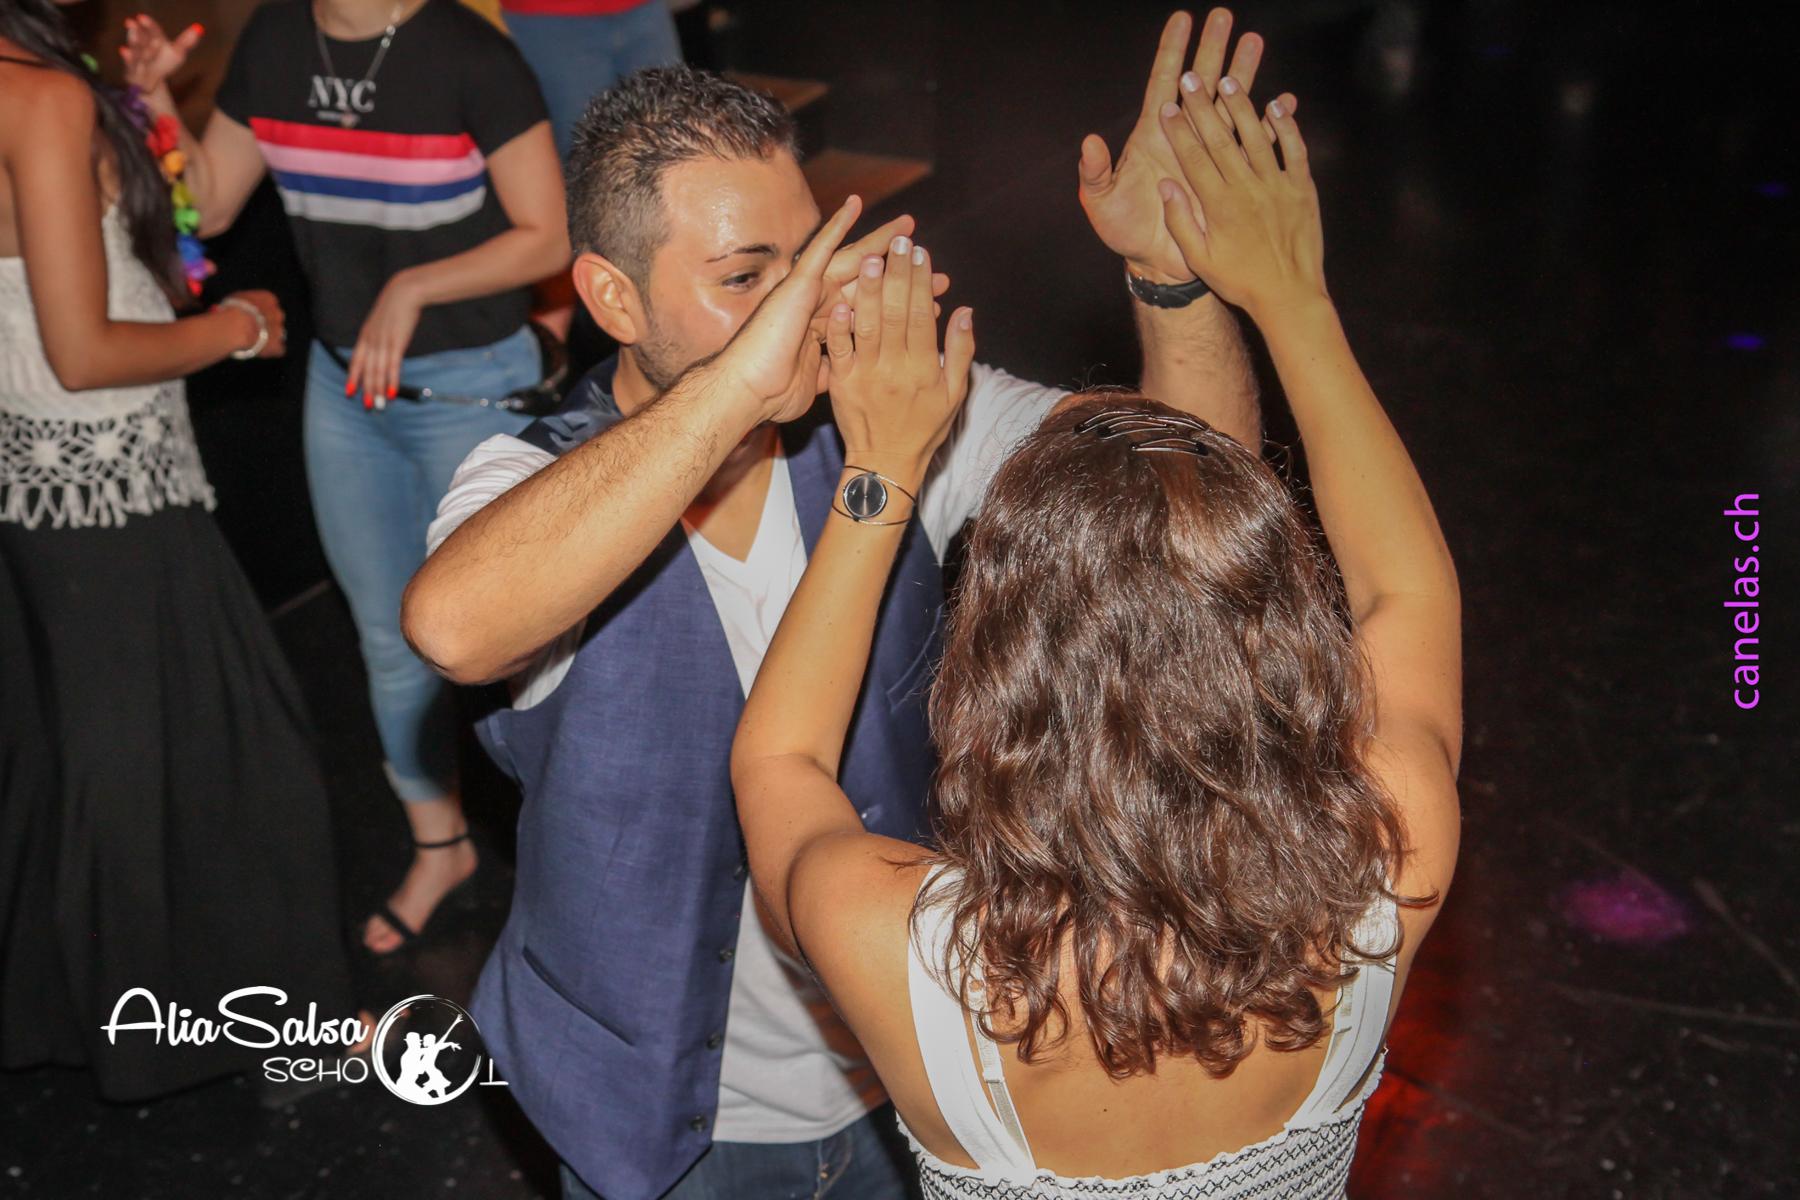 AliaSalsa ecole de danse lausanne soiree bachata salsa cubaineAlia Salsa Soireé Salsa - Bachata-43